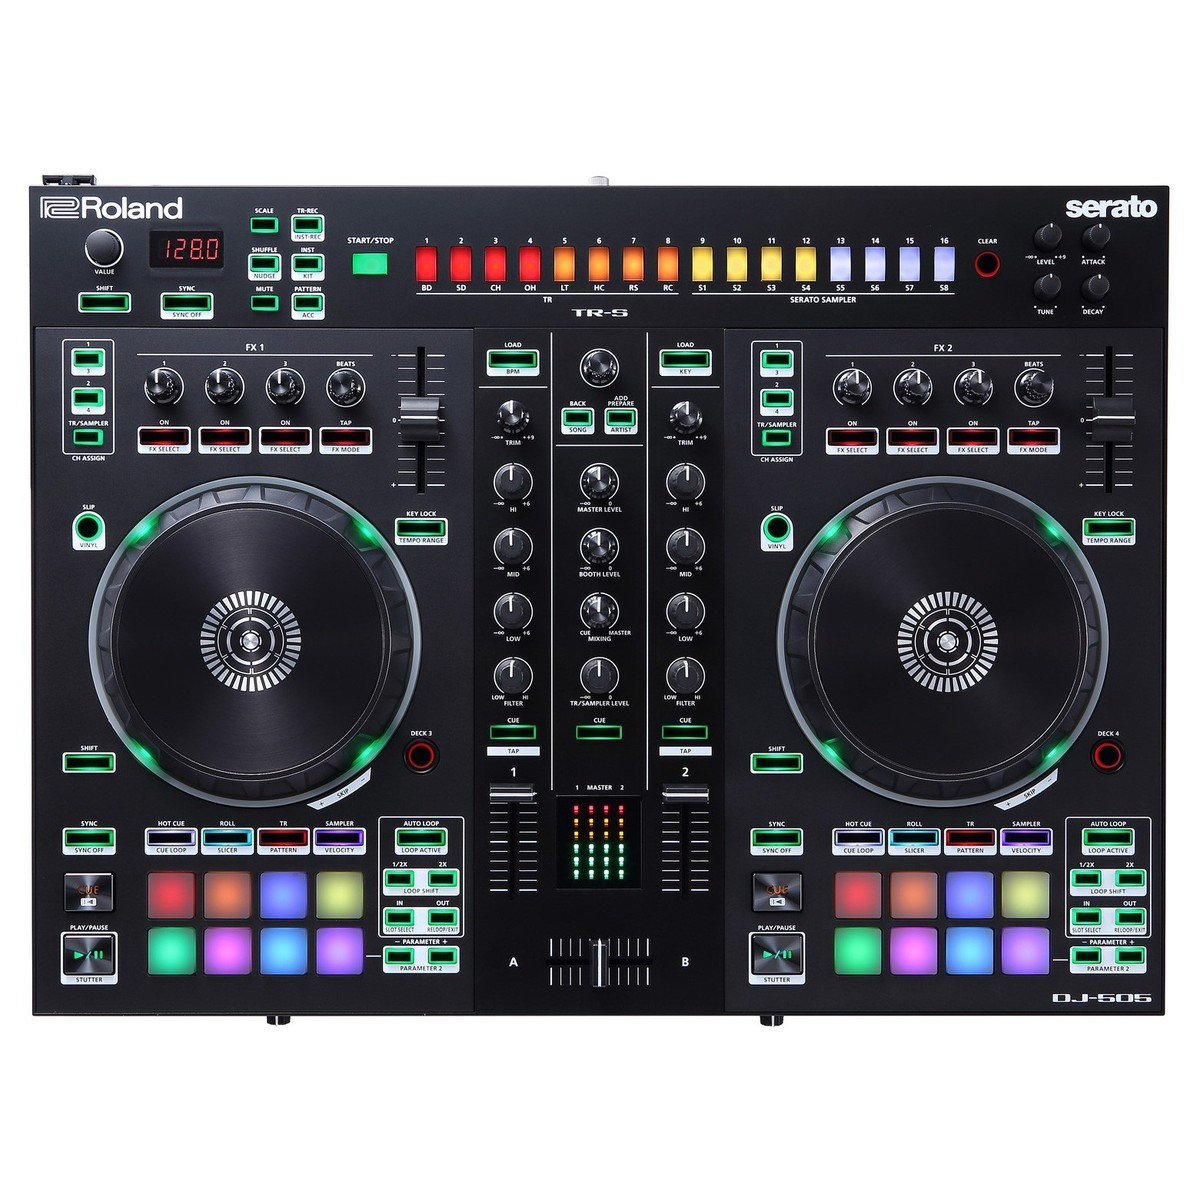 ROLAND DJ 505 MAPPING